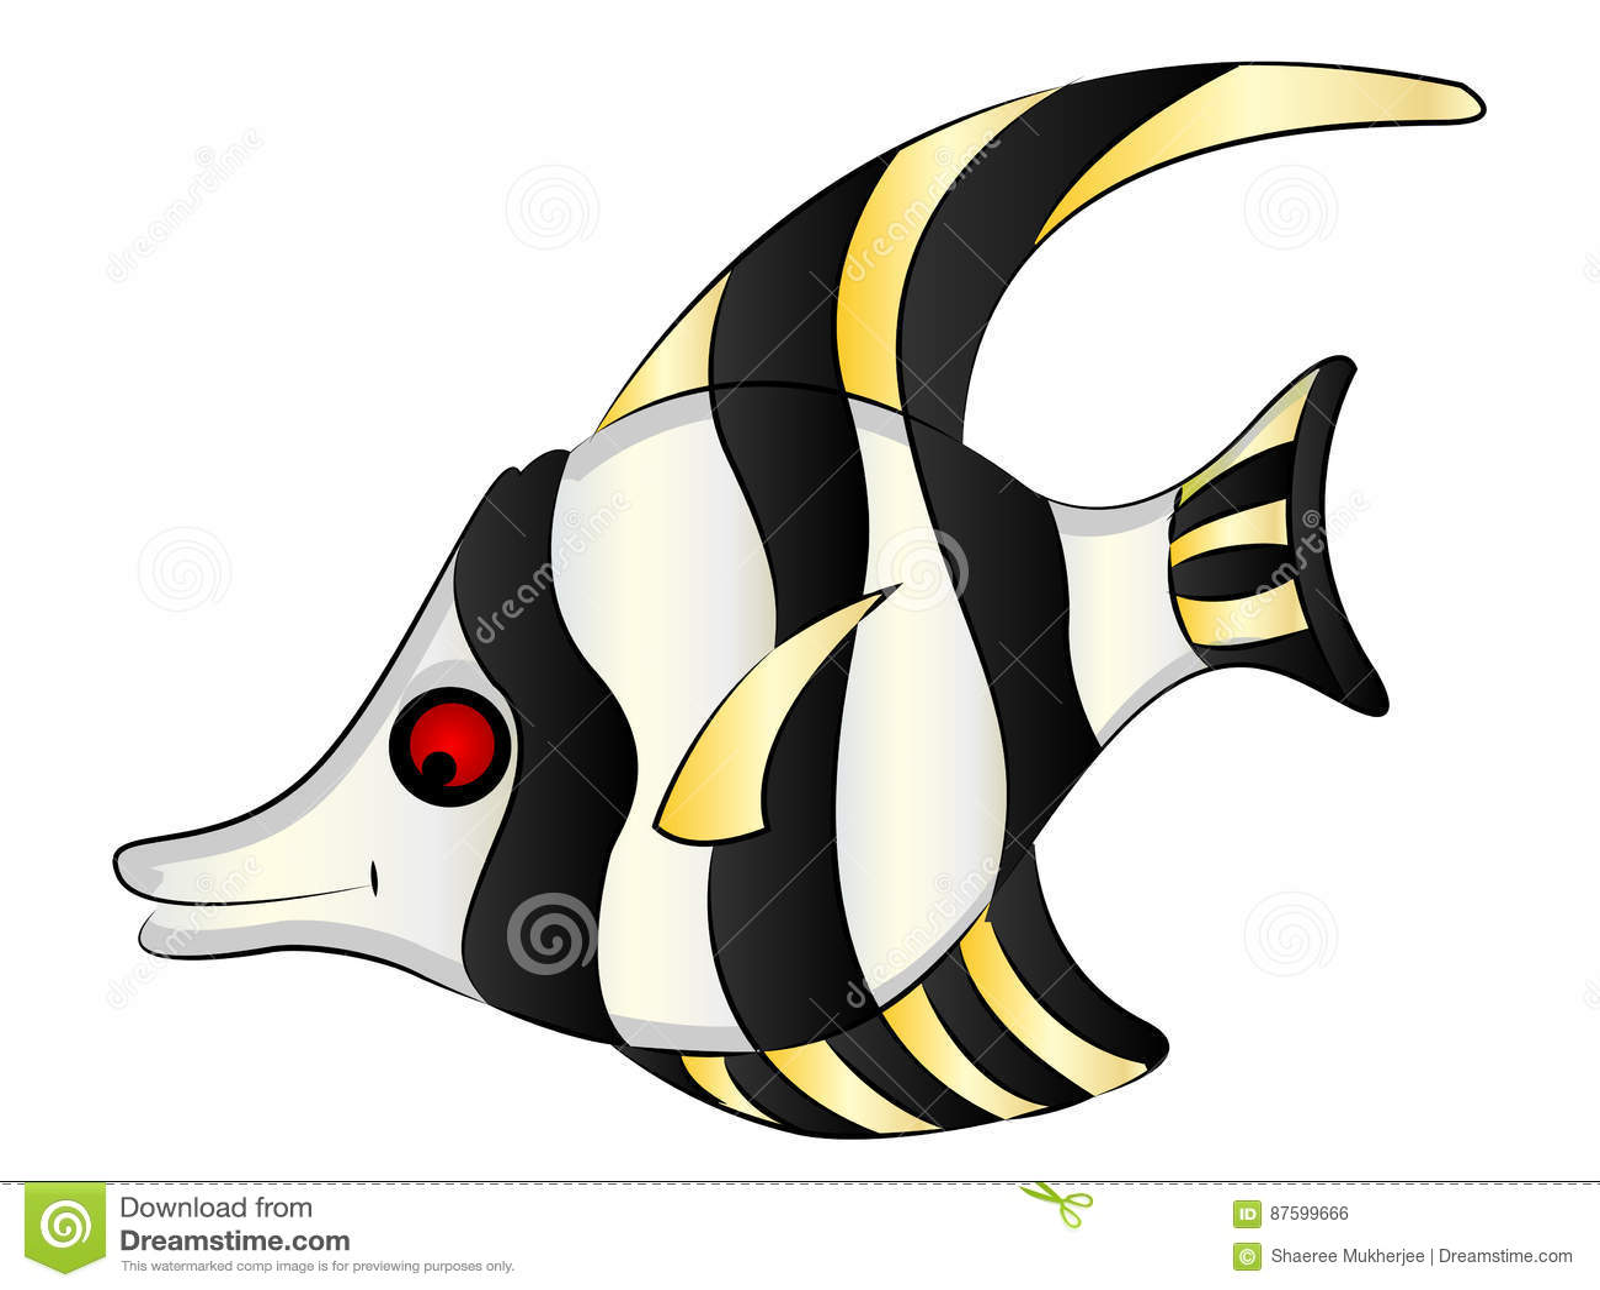 Uncategorized Cartoon Angel Fish cartoon aquarium angel fish stock vector image 87599666 royalty free download fish